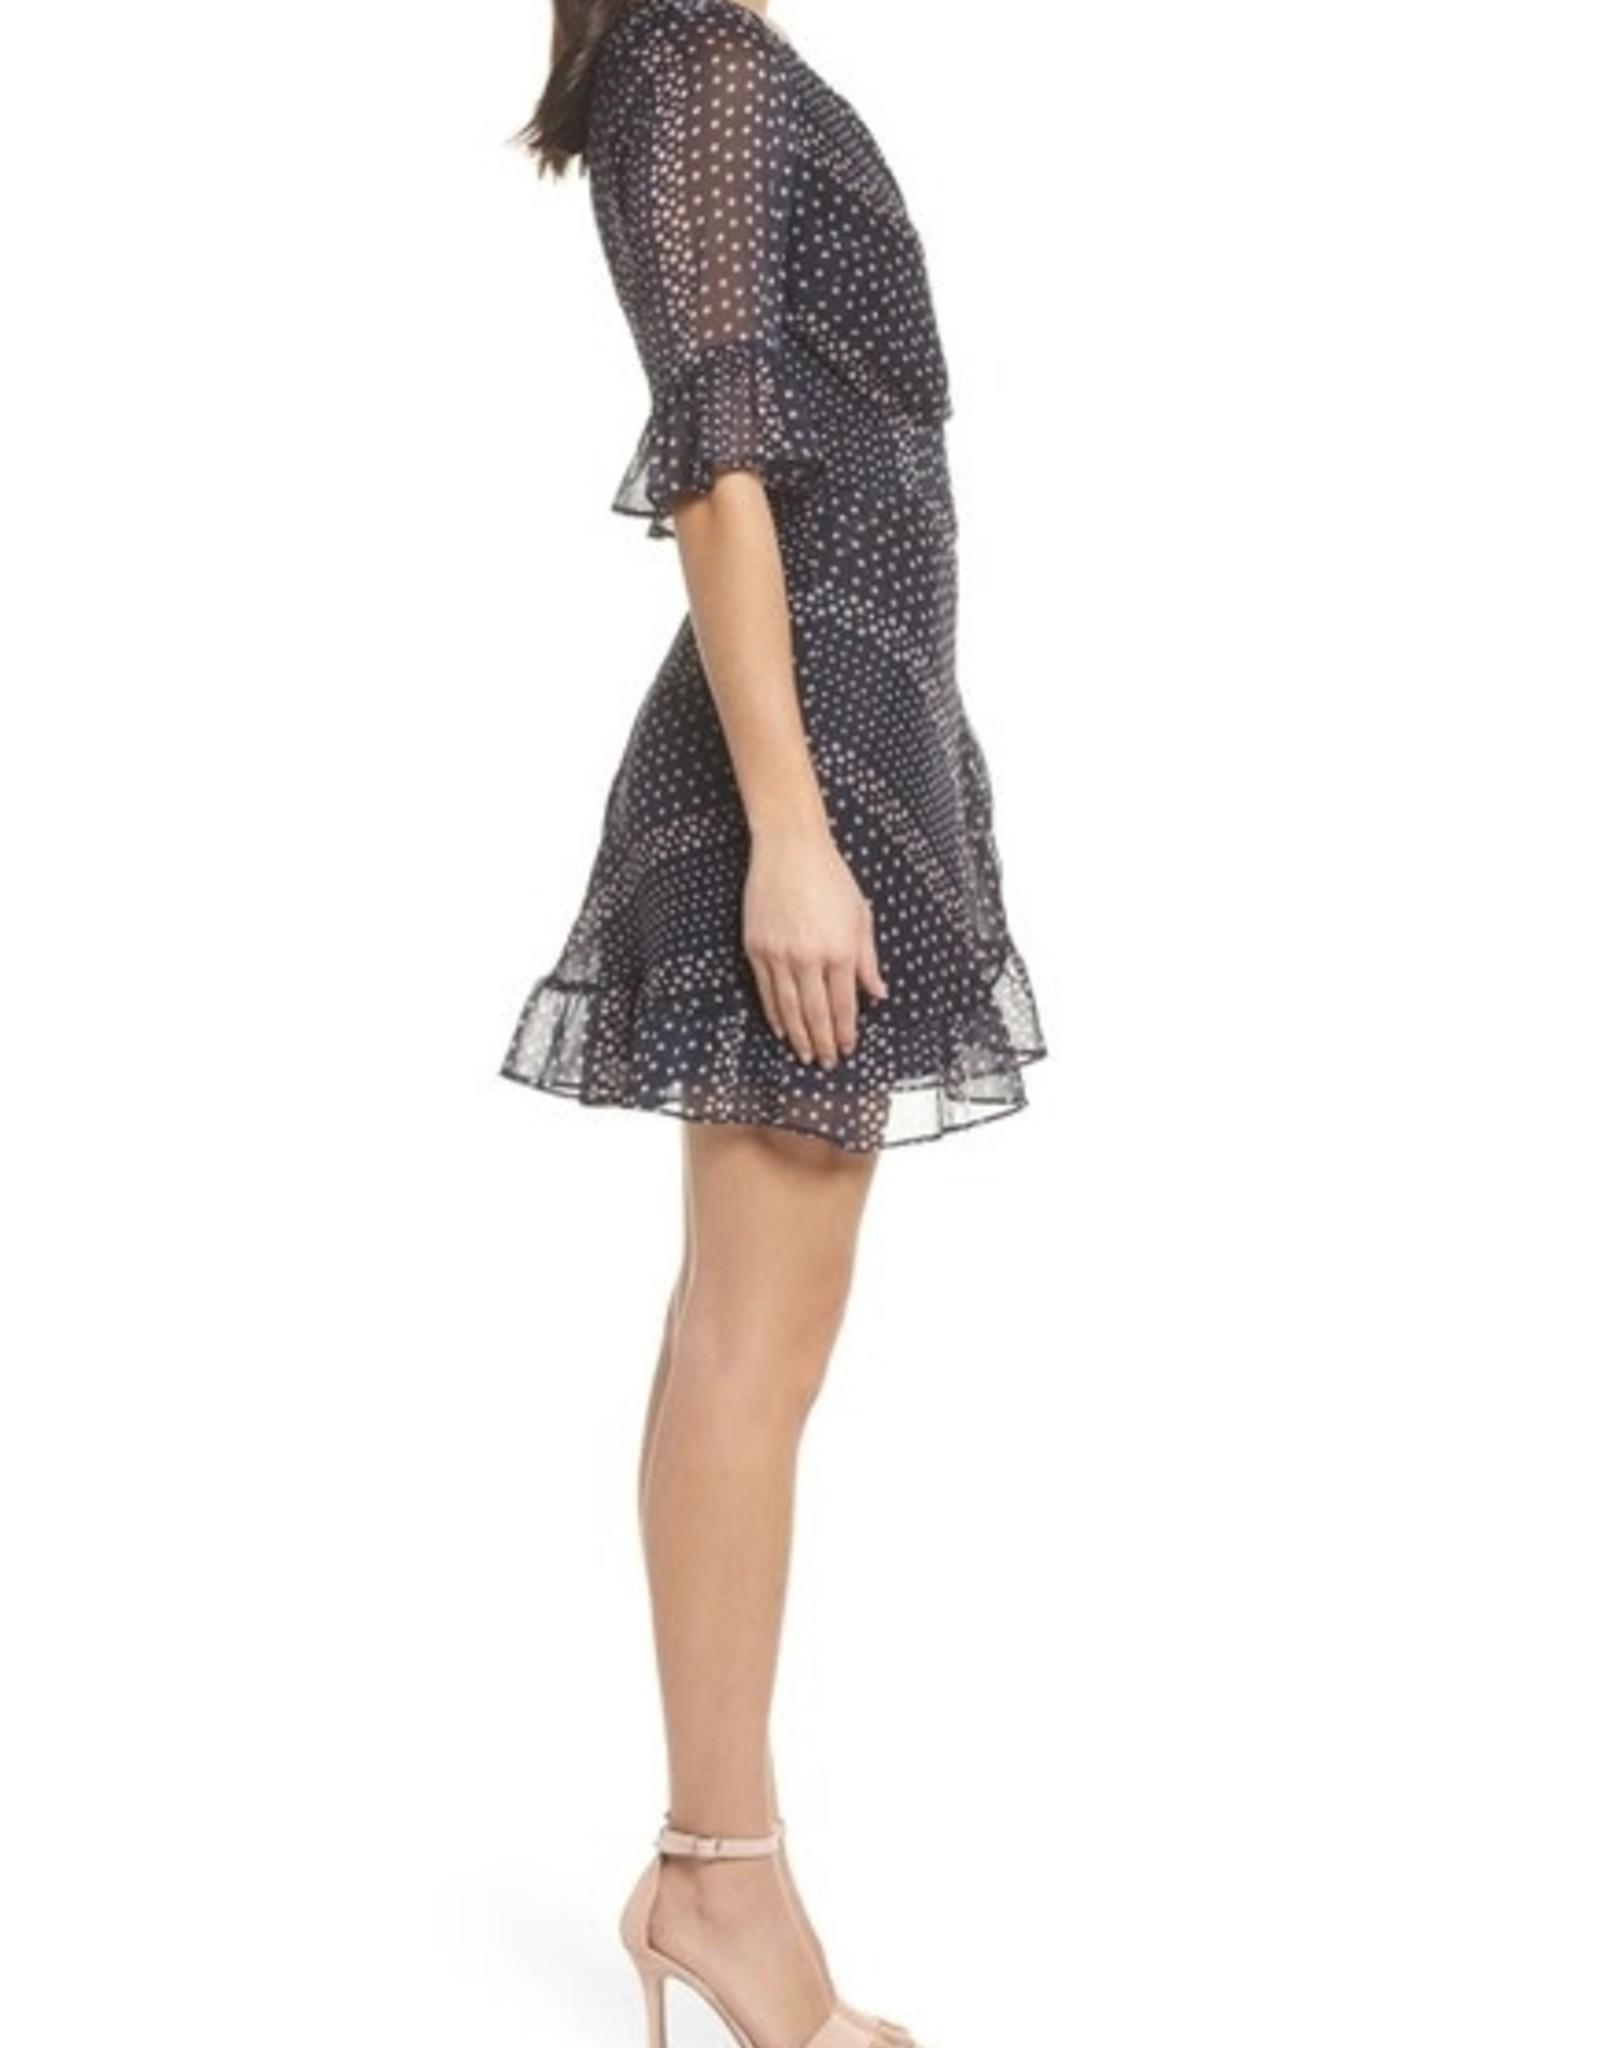 Striped Polka Dot Ruffle Dress